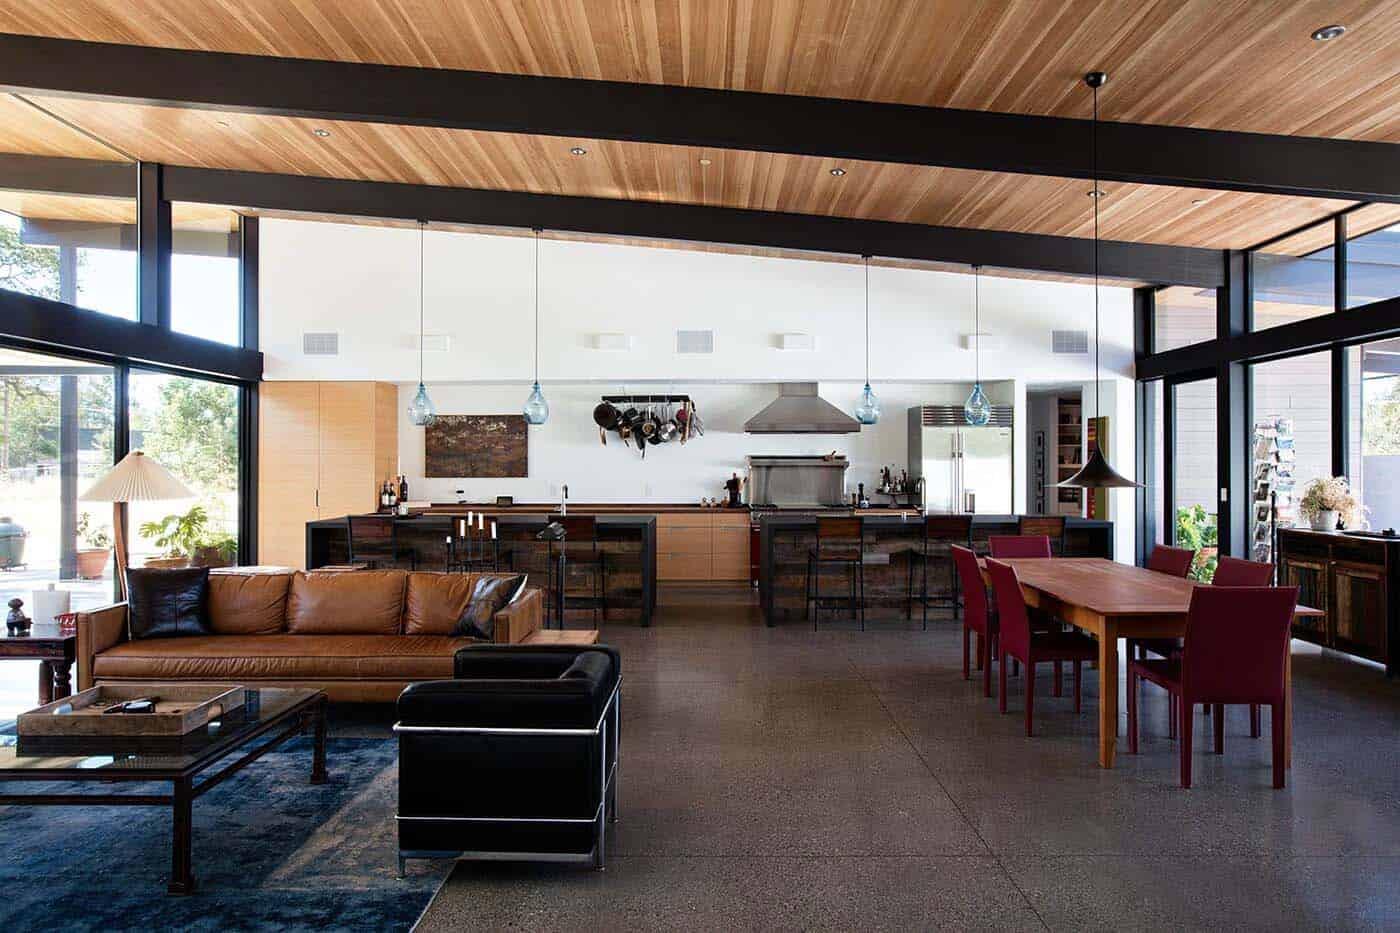 Sacramento Modern Residence-Klopf Architecture-03-1 Kindesign